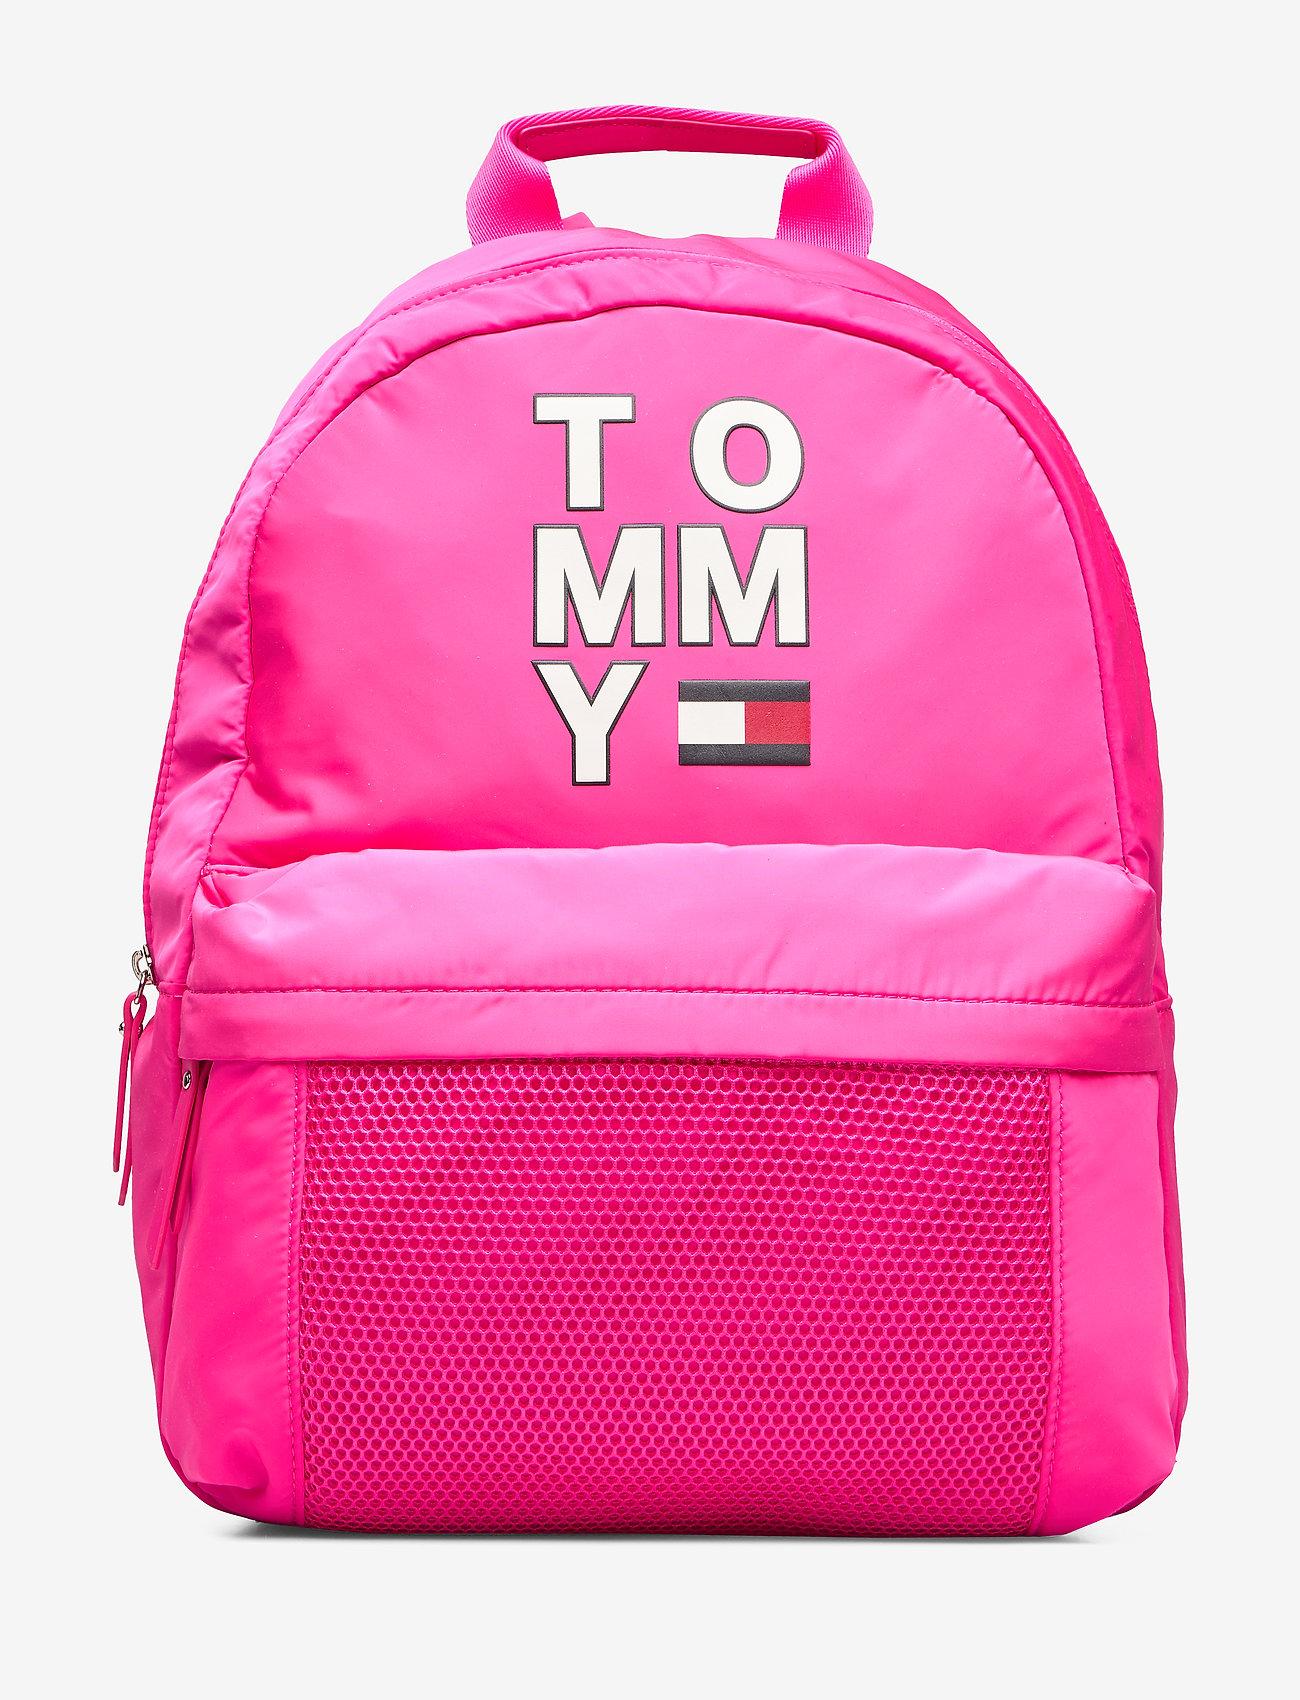 Tommy Hilfiger - TH KIDS TOMMY BACKPA - pink glo - 0